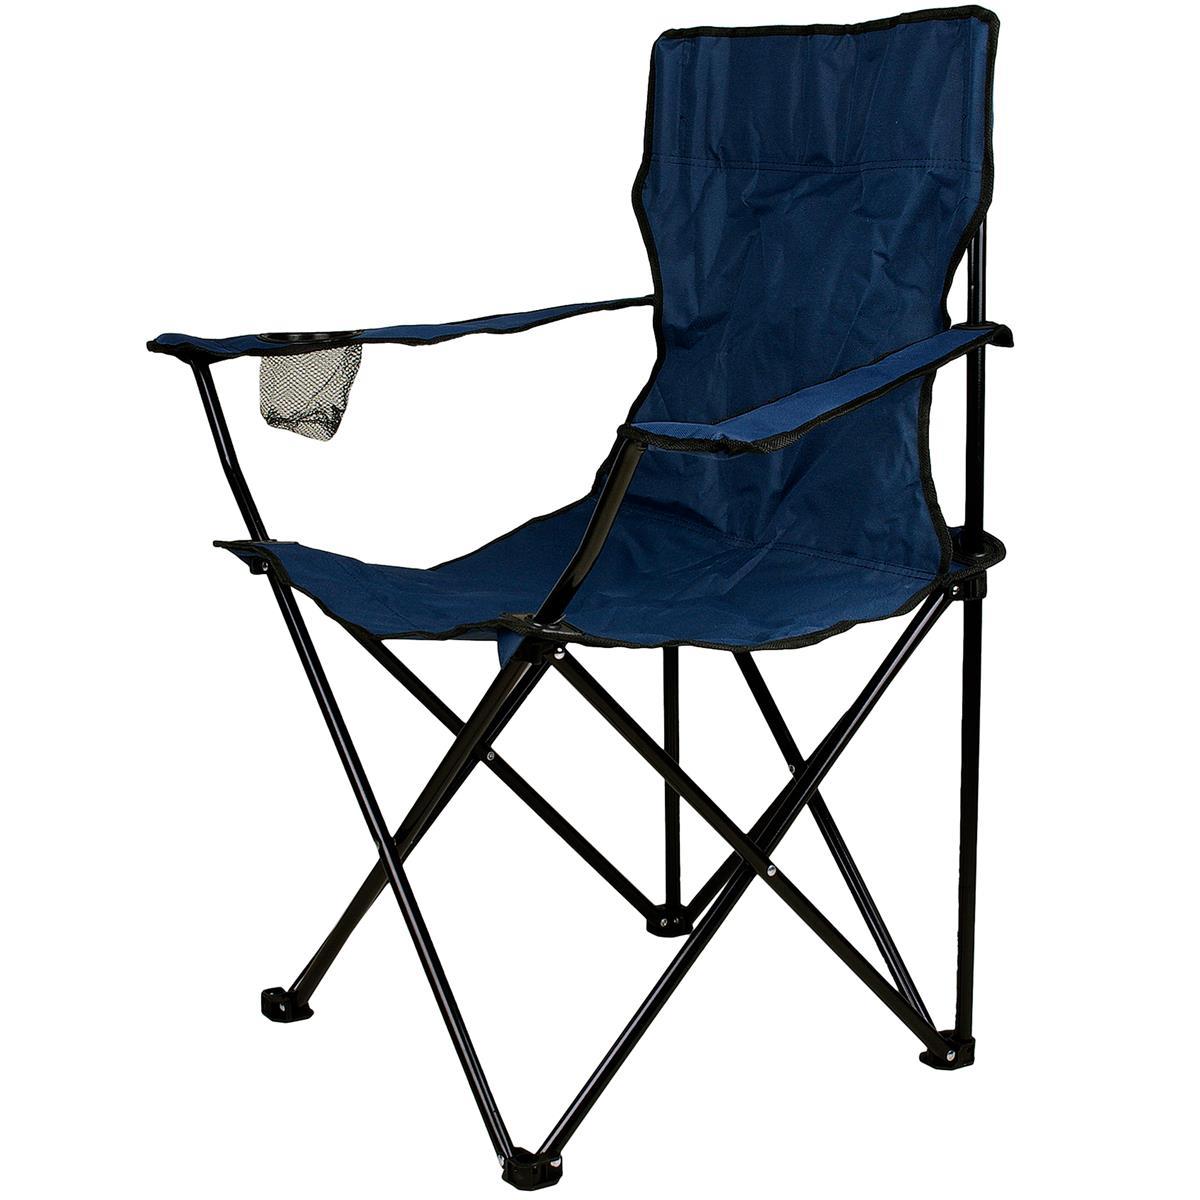 Faltstuhl Campingstuhl mit Armlehne Getränkehalter blau faltbar